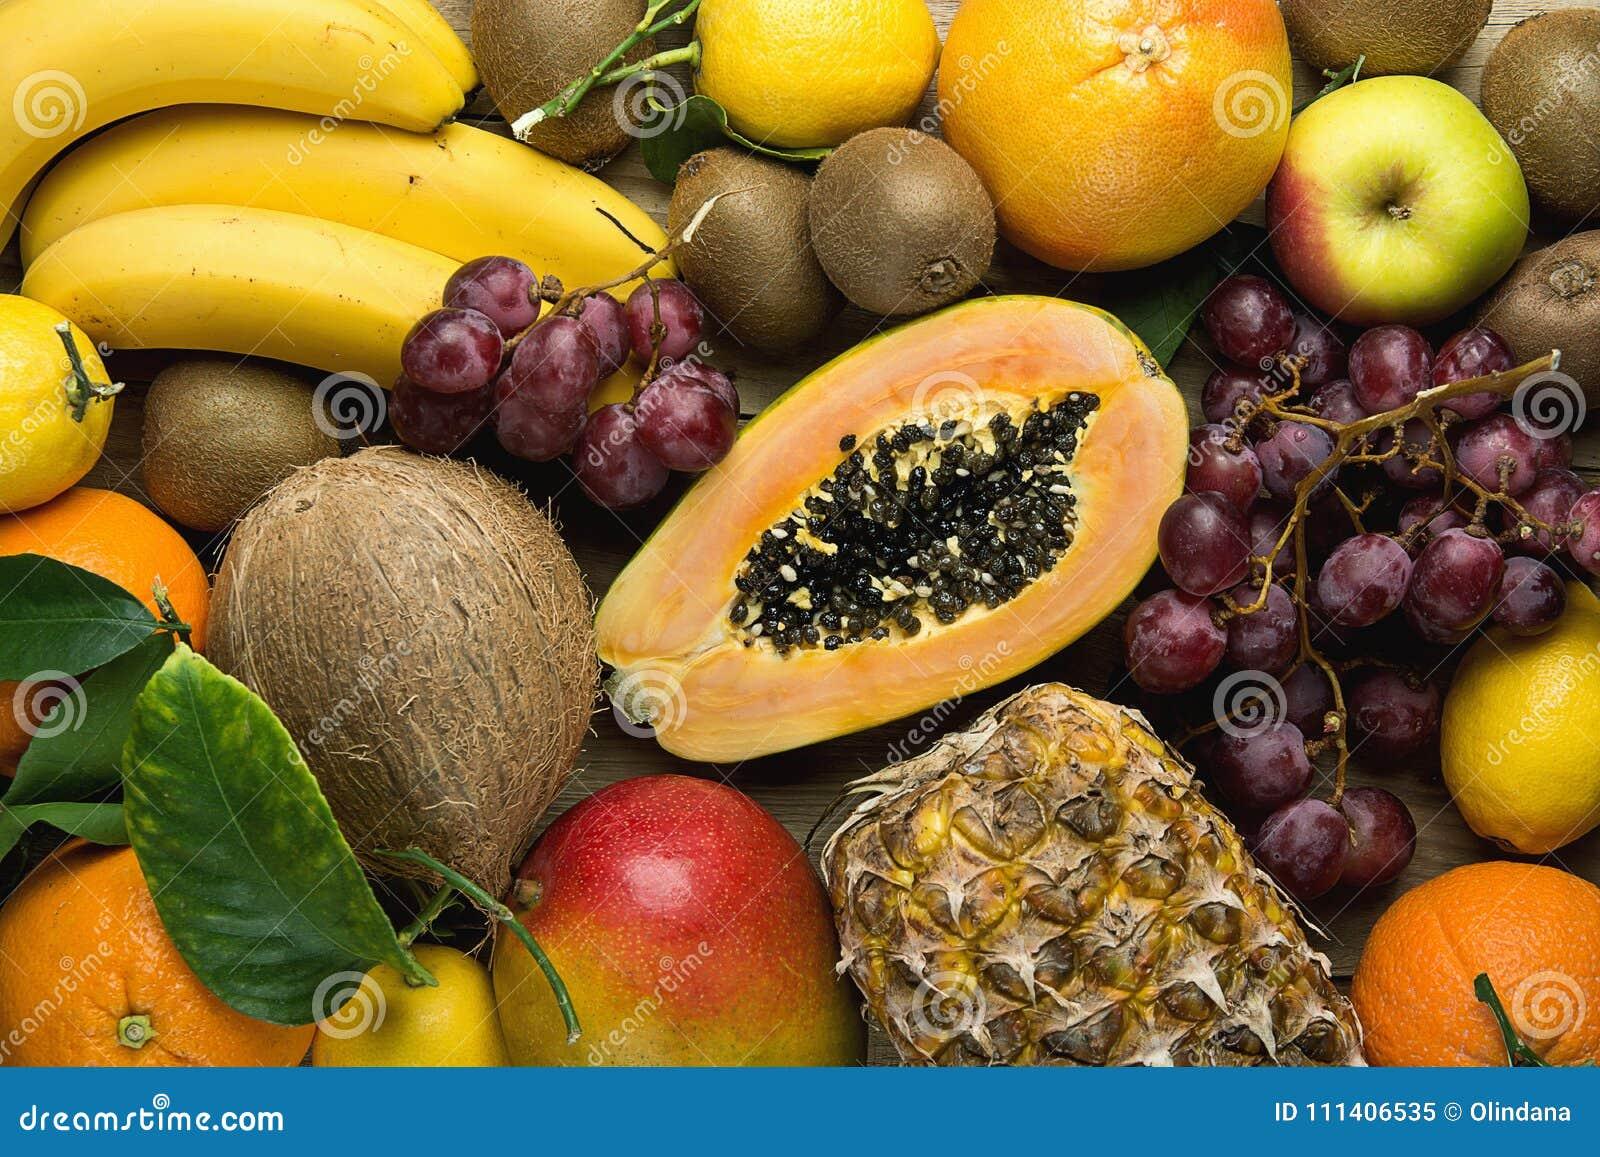 Assortment Of Fresh Tropical And Summer Seasonal Fruits Pineapple Papaya Mango Coconut Oranges Kiwi Bananas Lemons Grapefruit Stock Image Image Of Lemons Green 111406535